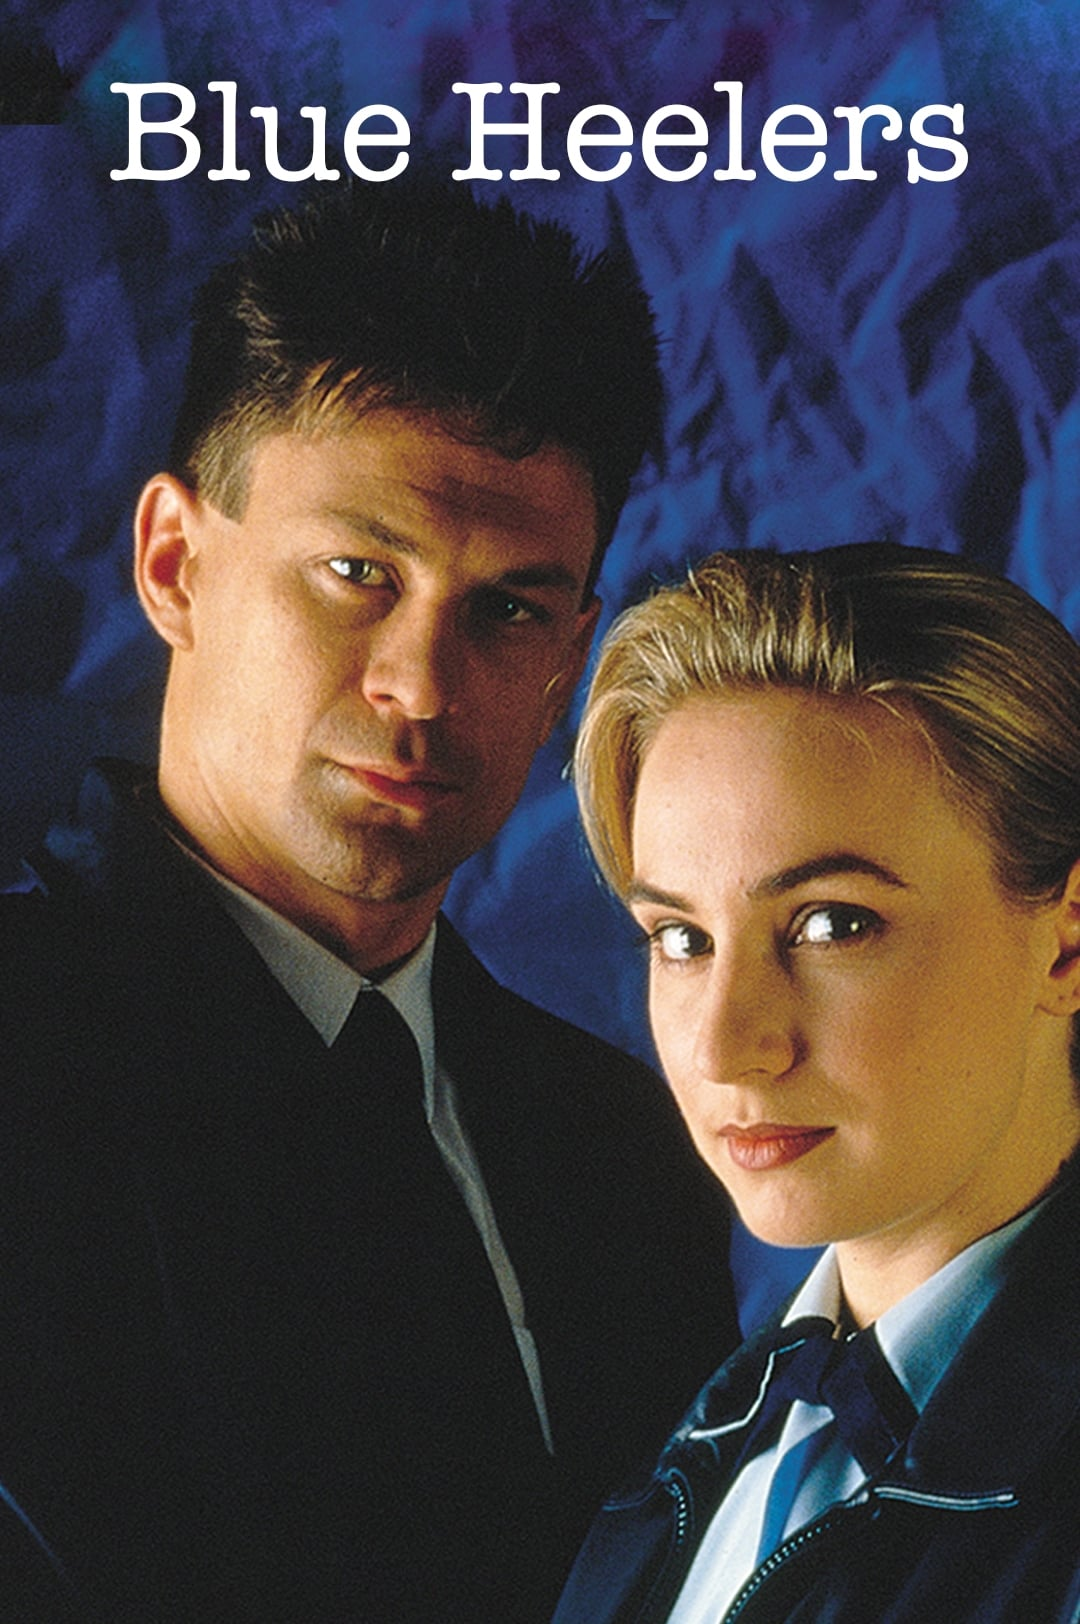 Blue Heelers (1994)